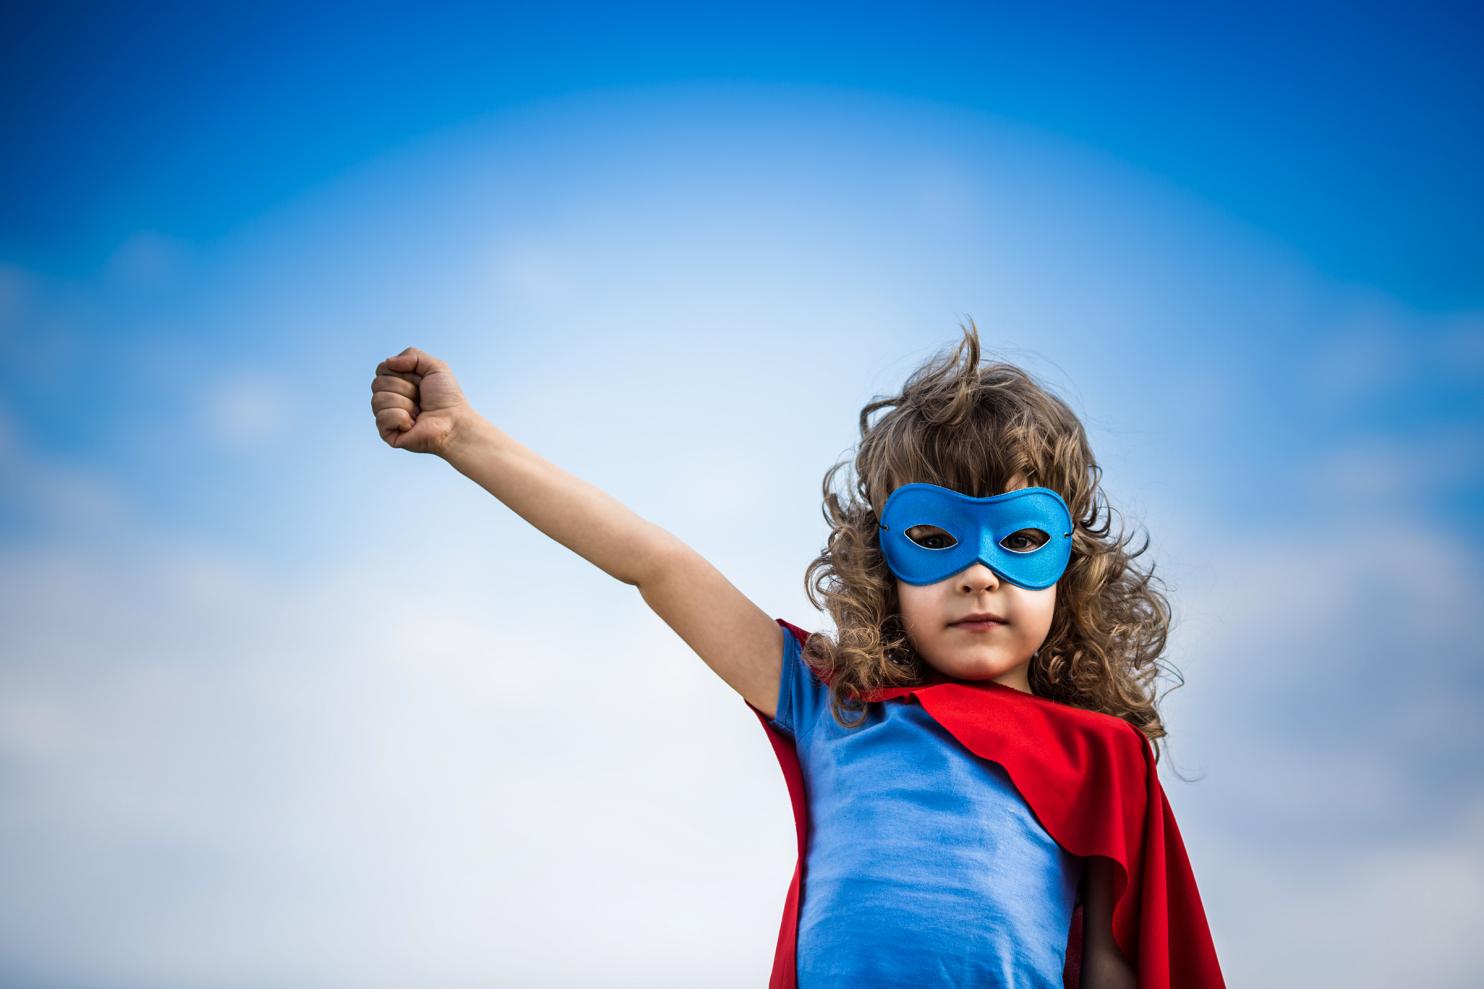 web-superhero-child-kid-girl-arm-mask-sunny-studio-shutterstock_187535036